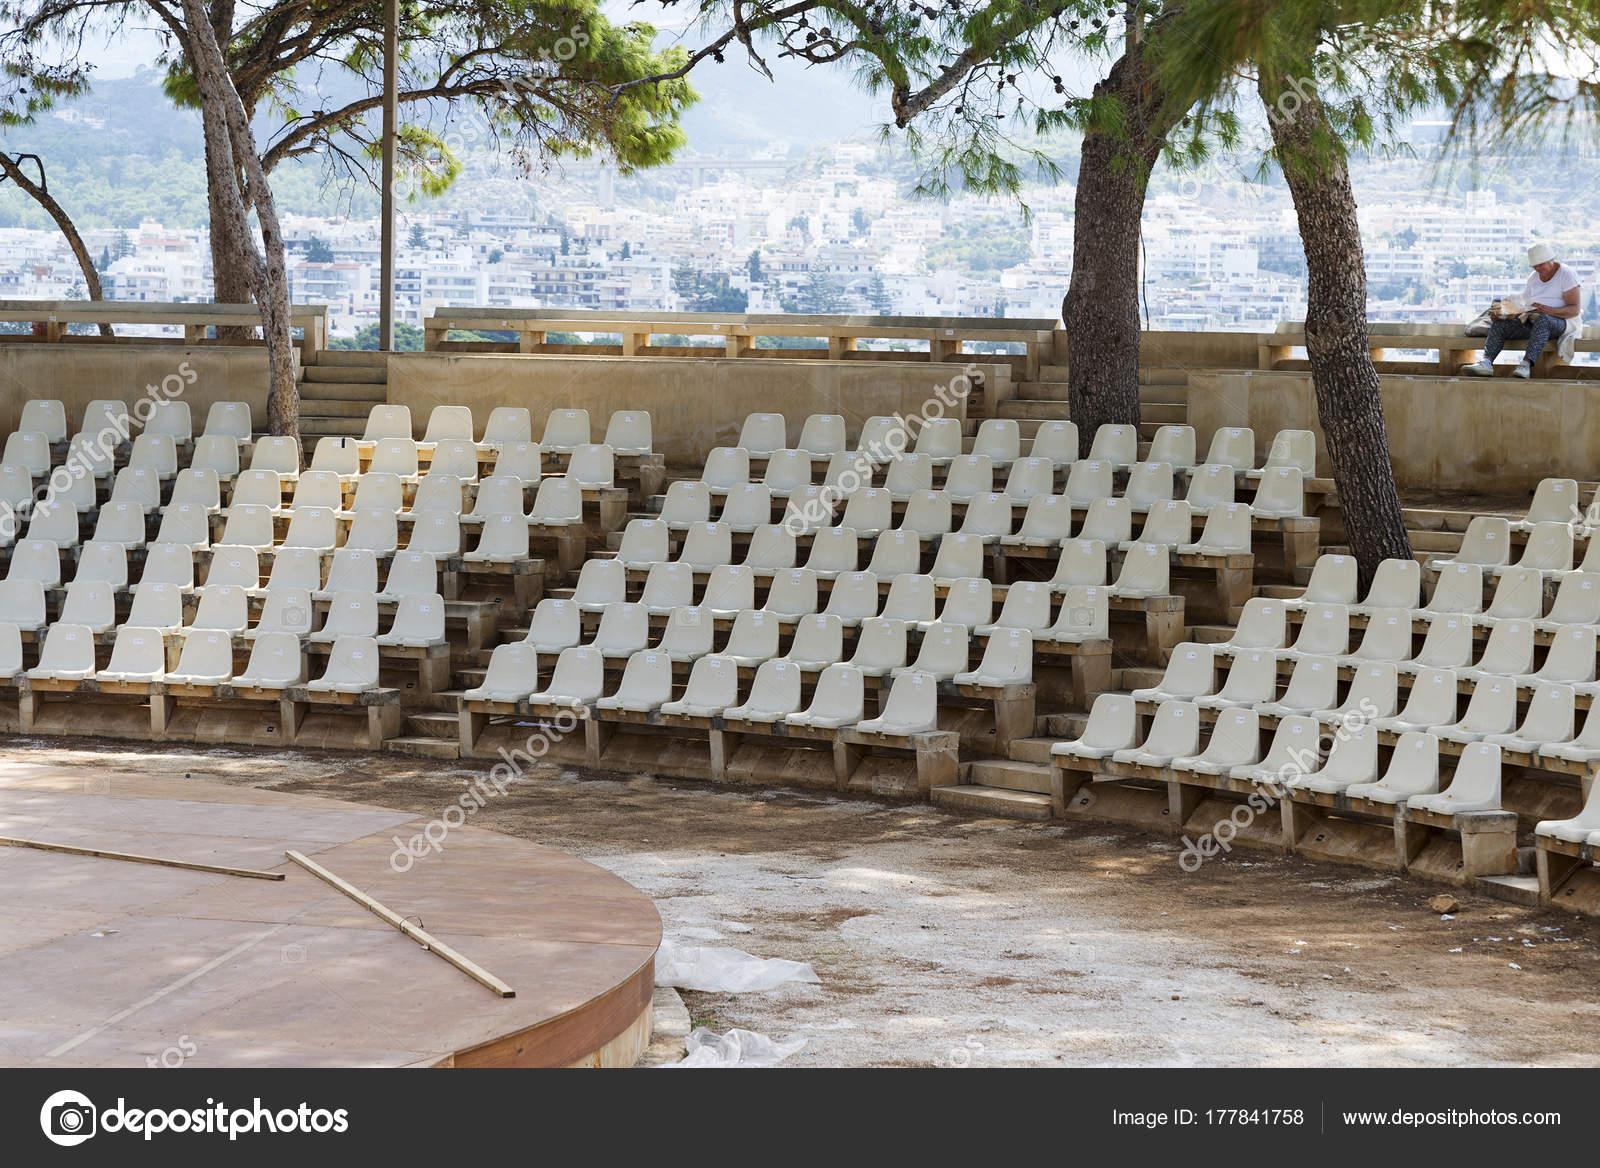 Stock Sedie In Plastica.Sedie Di Plastica Per Lo Stadio Teatro All Aria Aperta Foto Stock